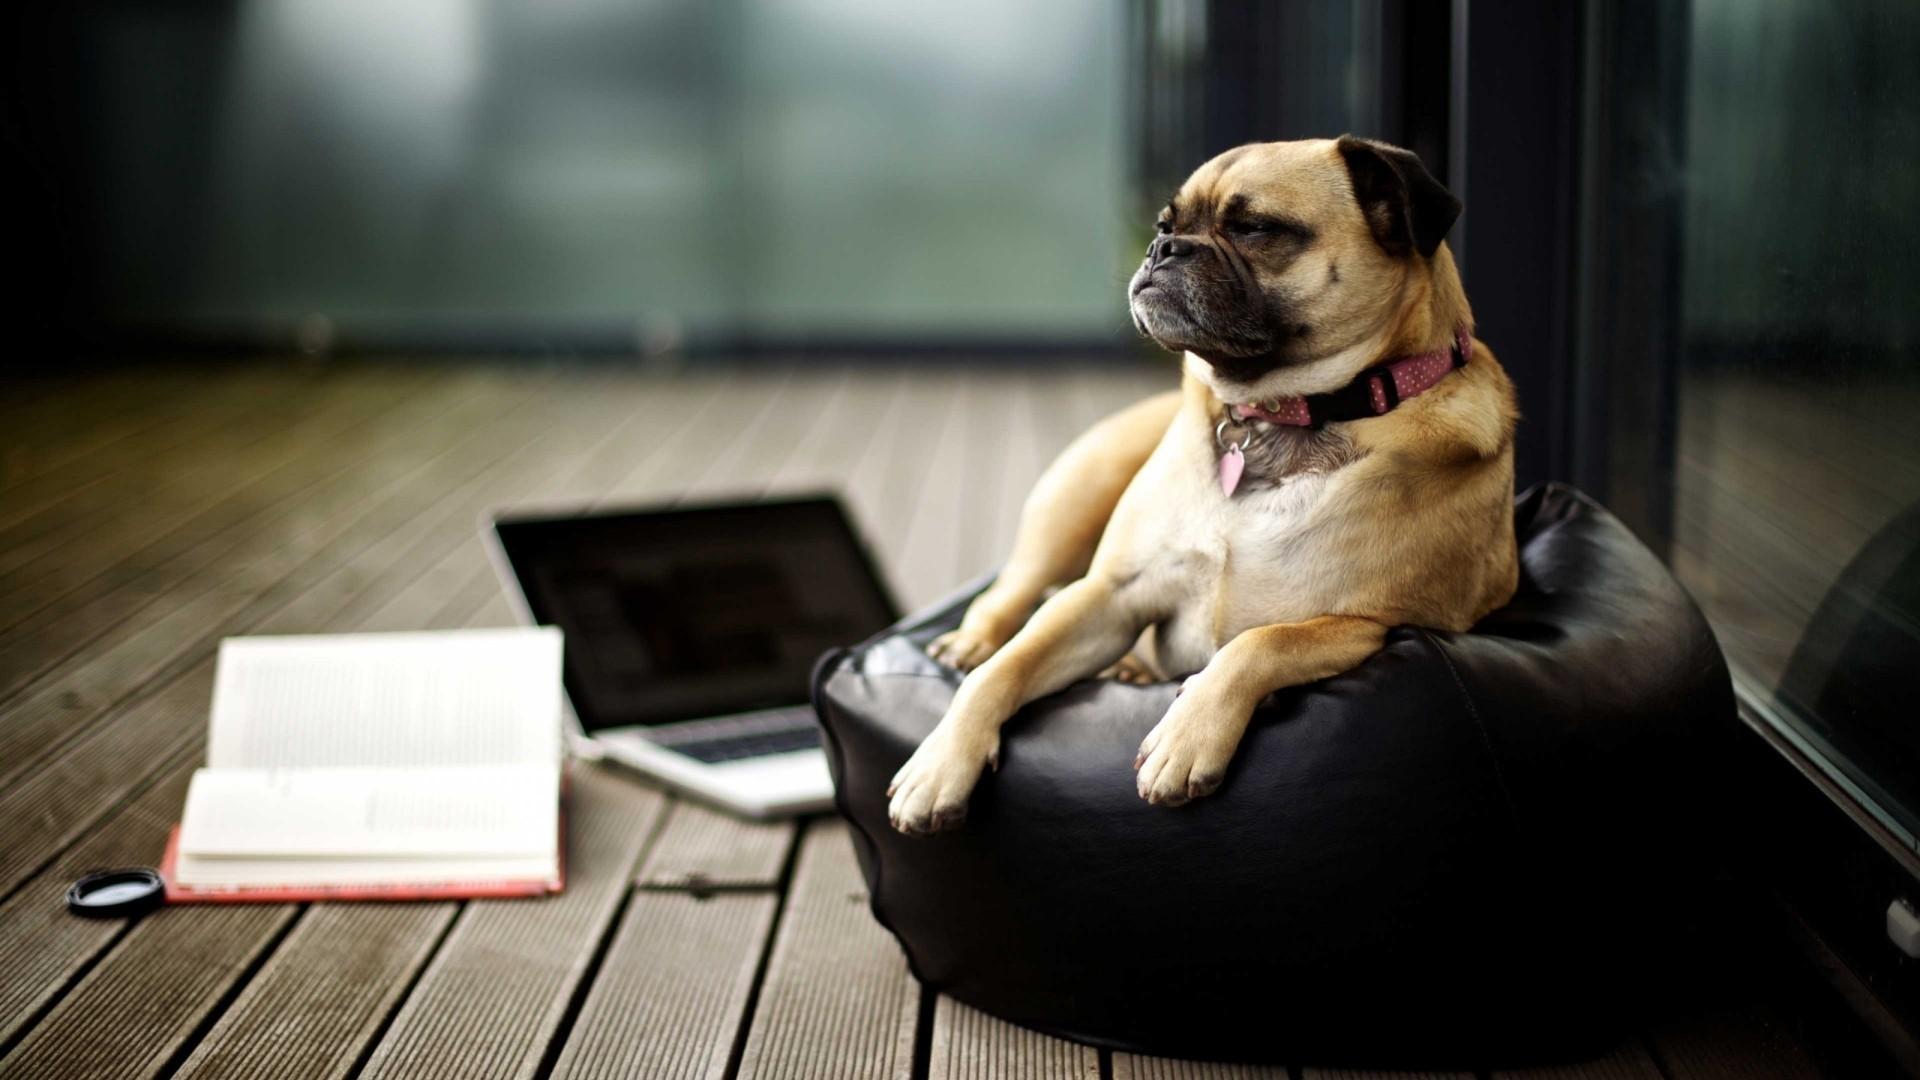 Black Books Dog Laptop Mac Book Pug Puppy Mammal Like